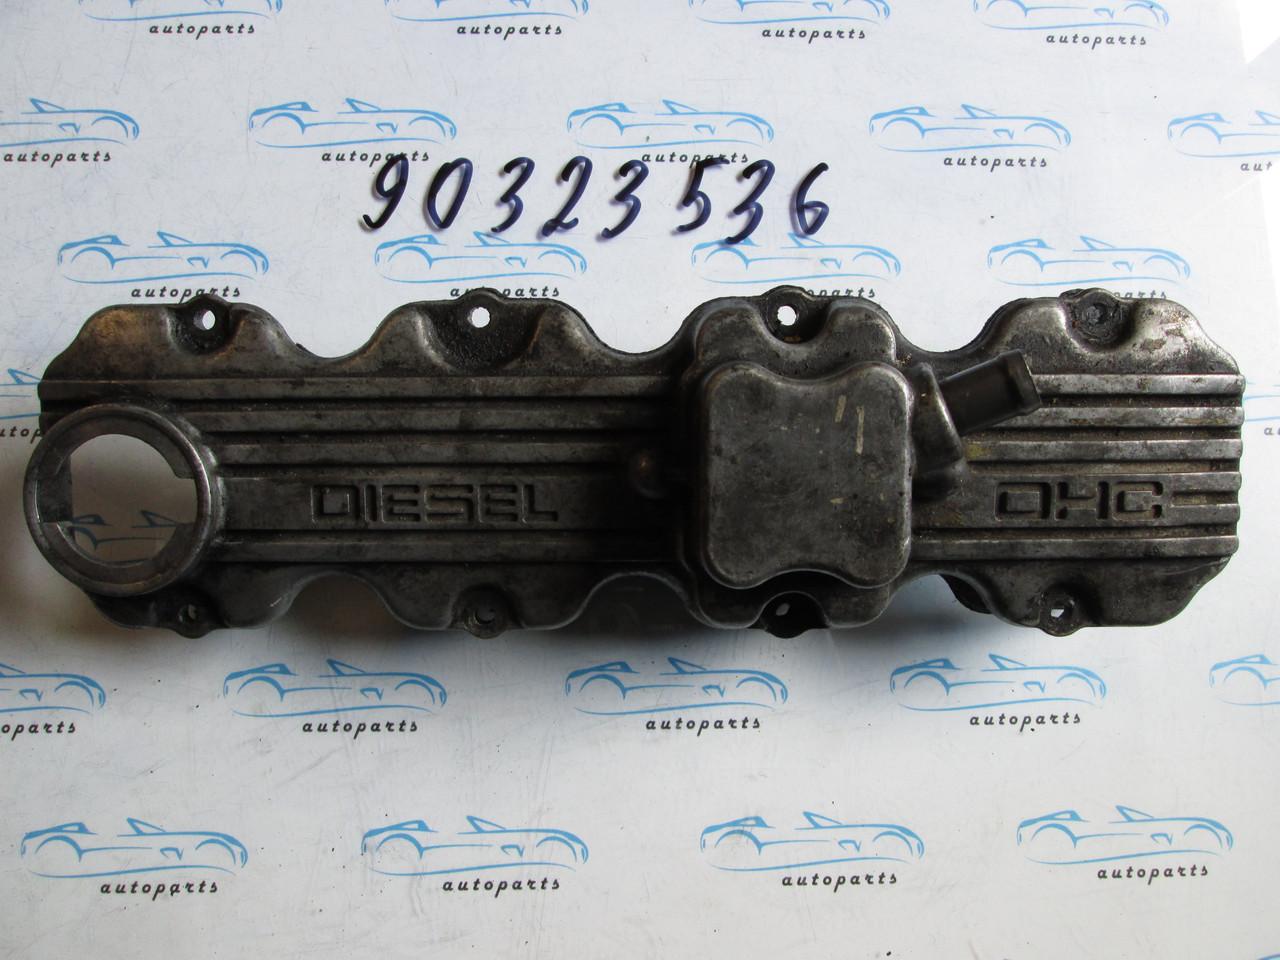 Клапанная крышка Opel 1.7D 8V, 90323536